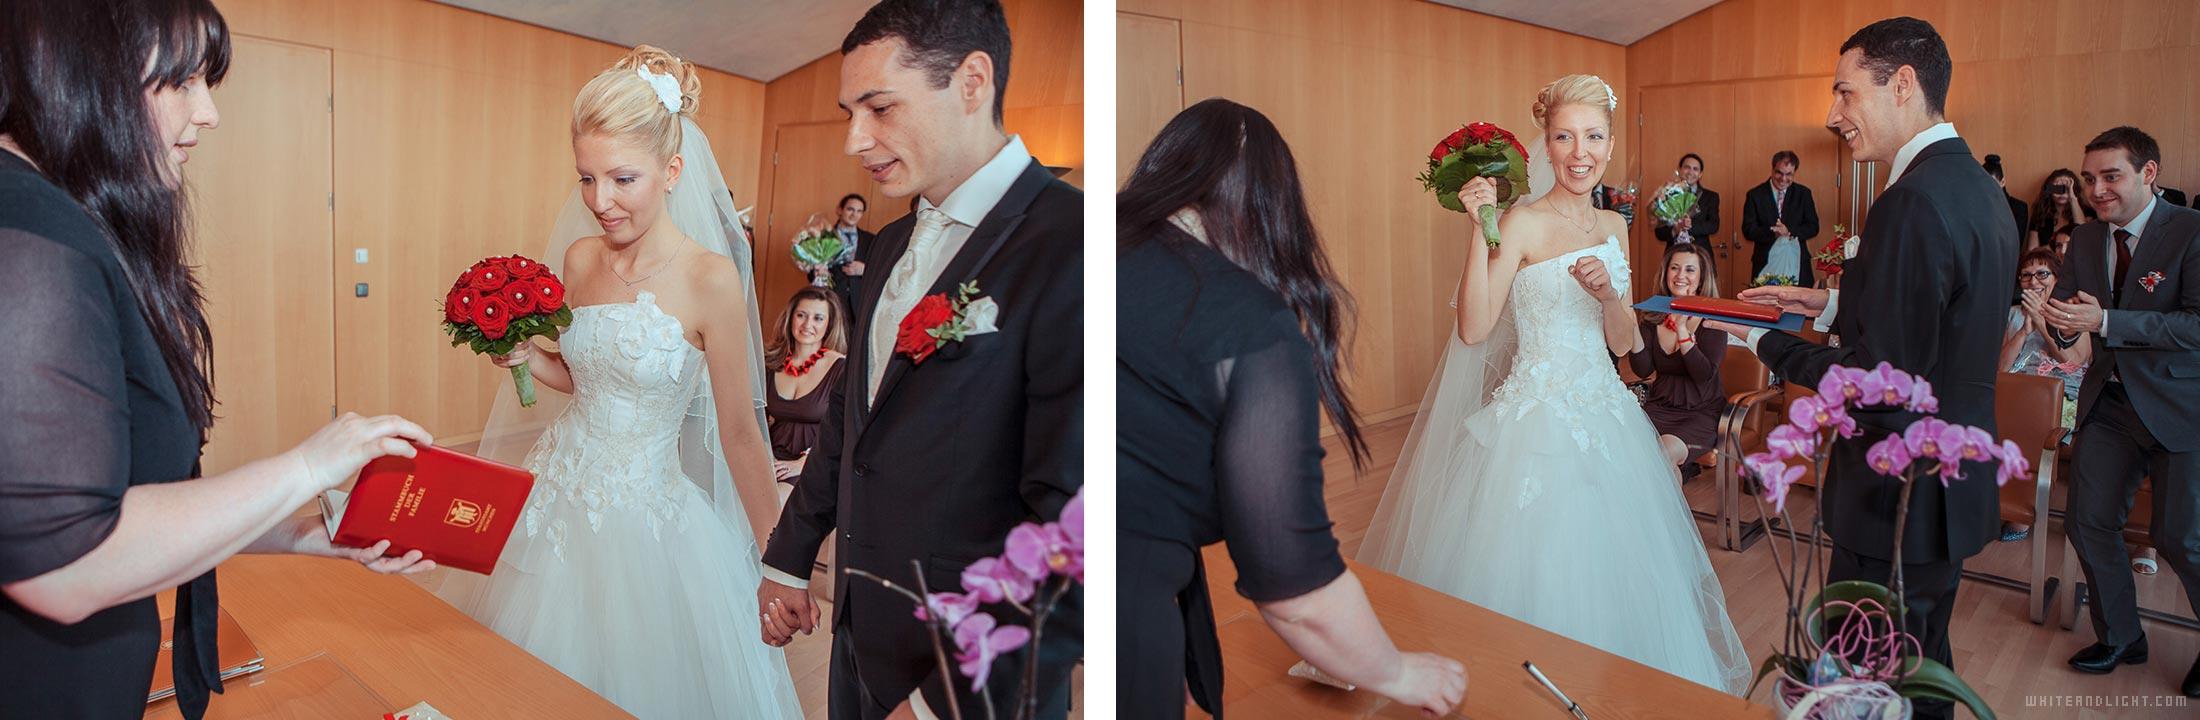 cost of wedding photographer